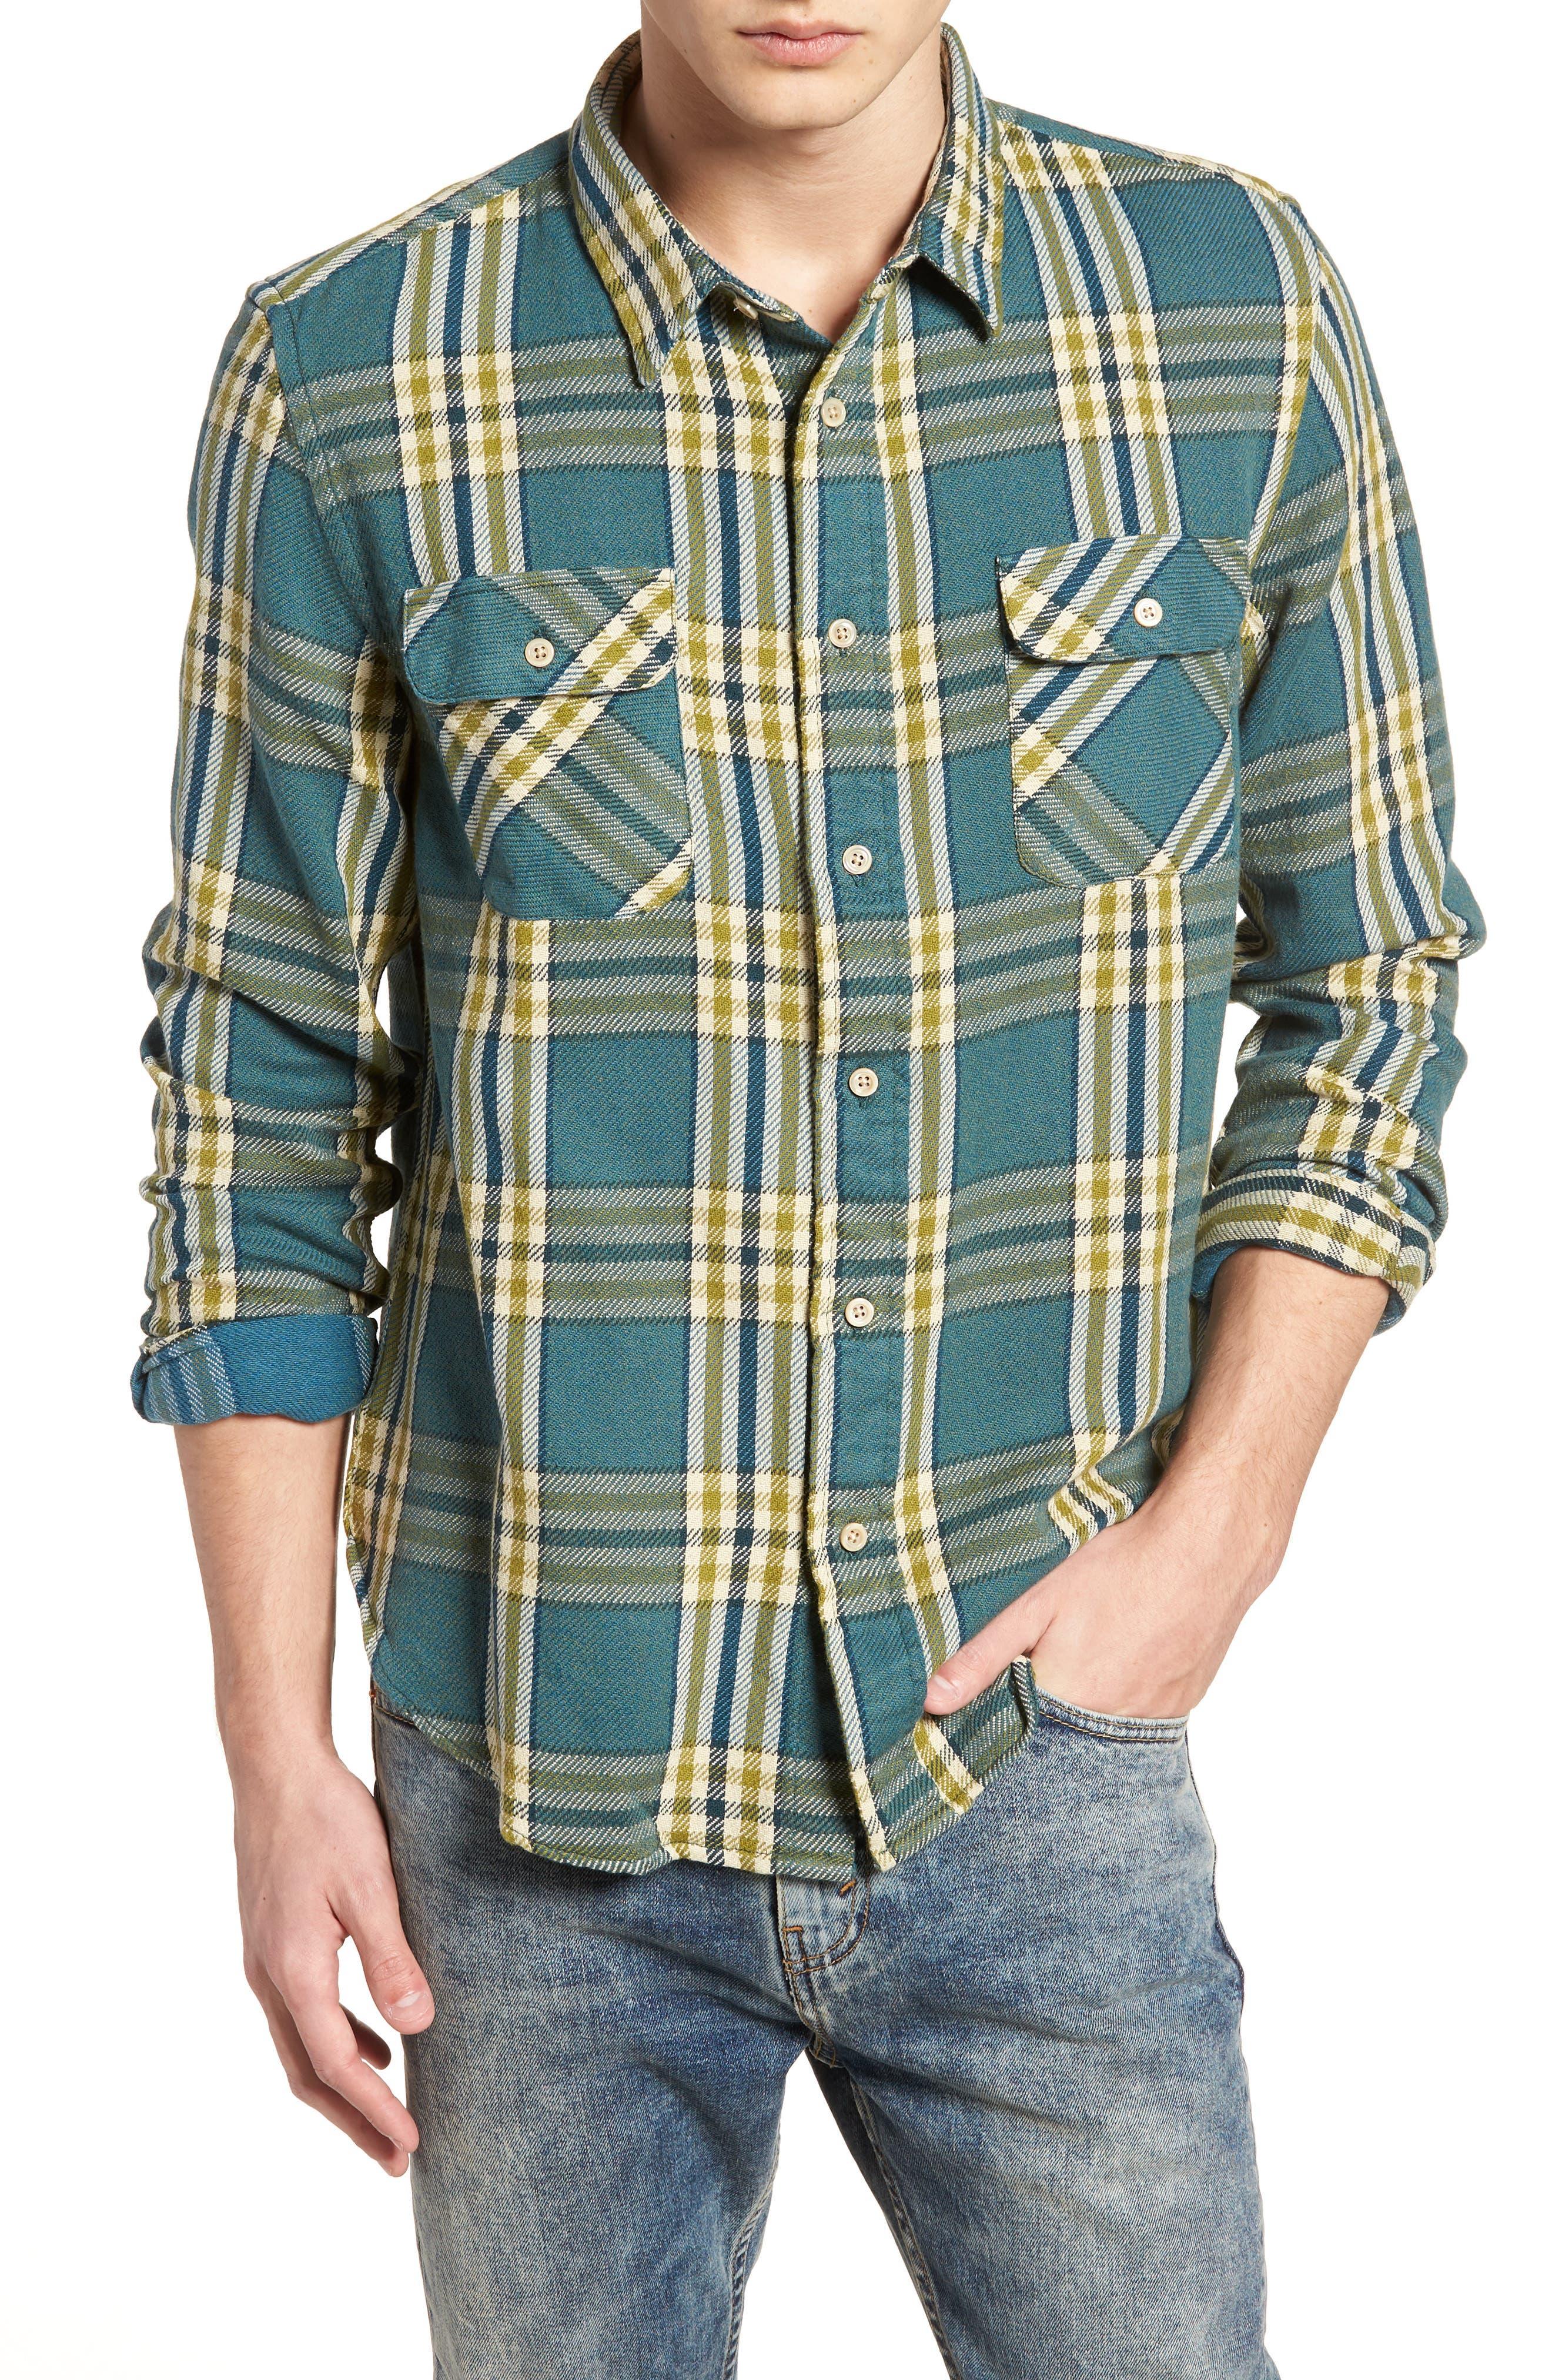 Shorthorn Western Shirt,                             Main thumbnail 1, color,                             Under Water Blue Multi